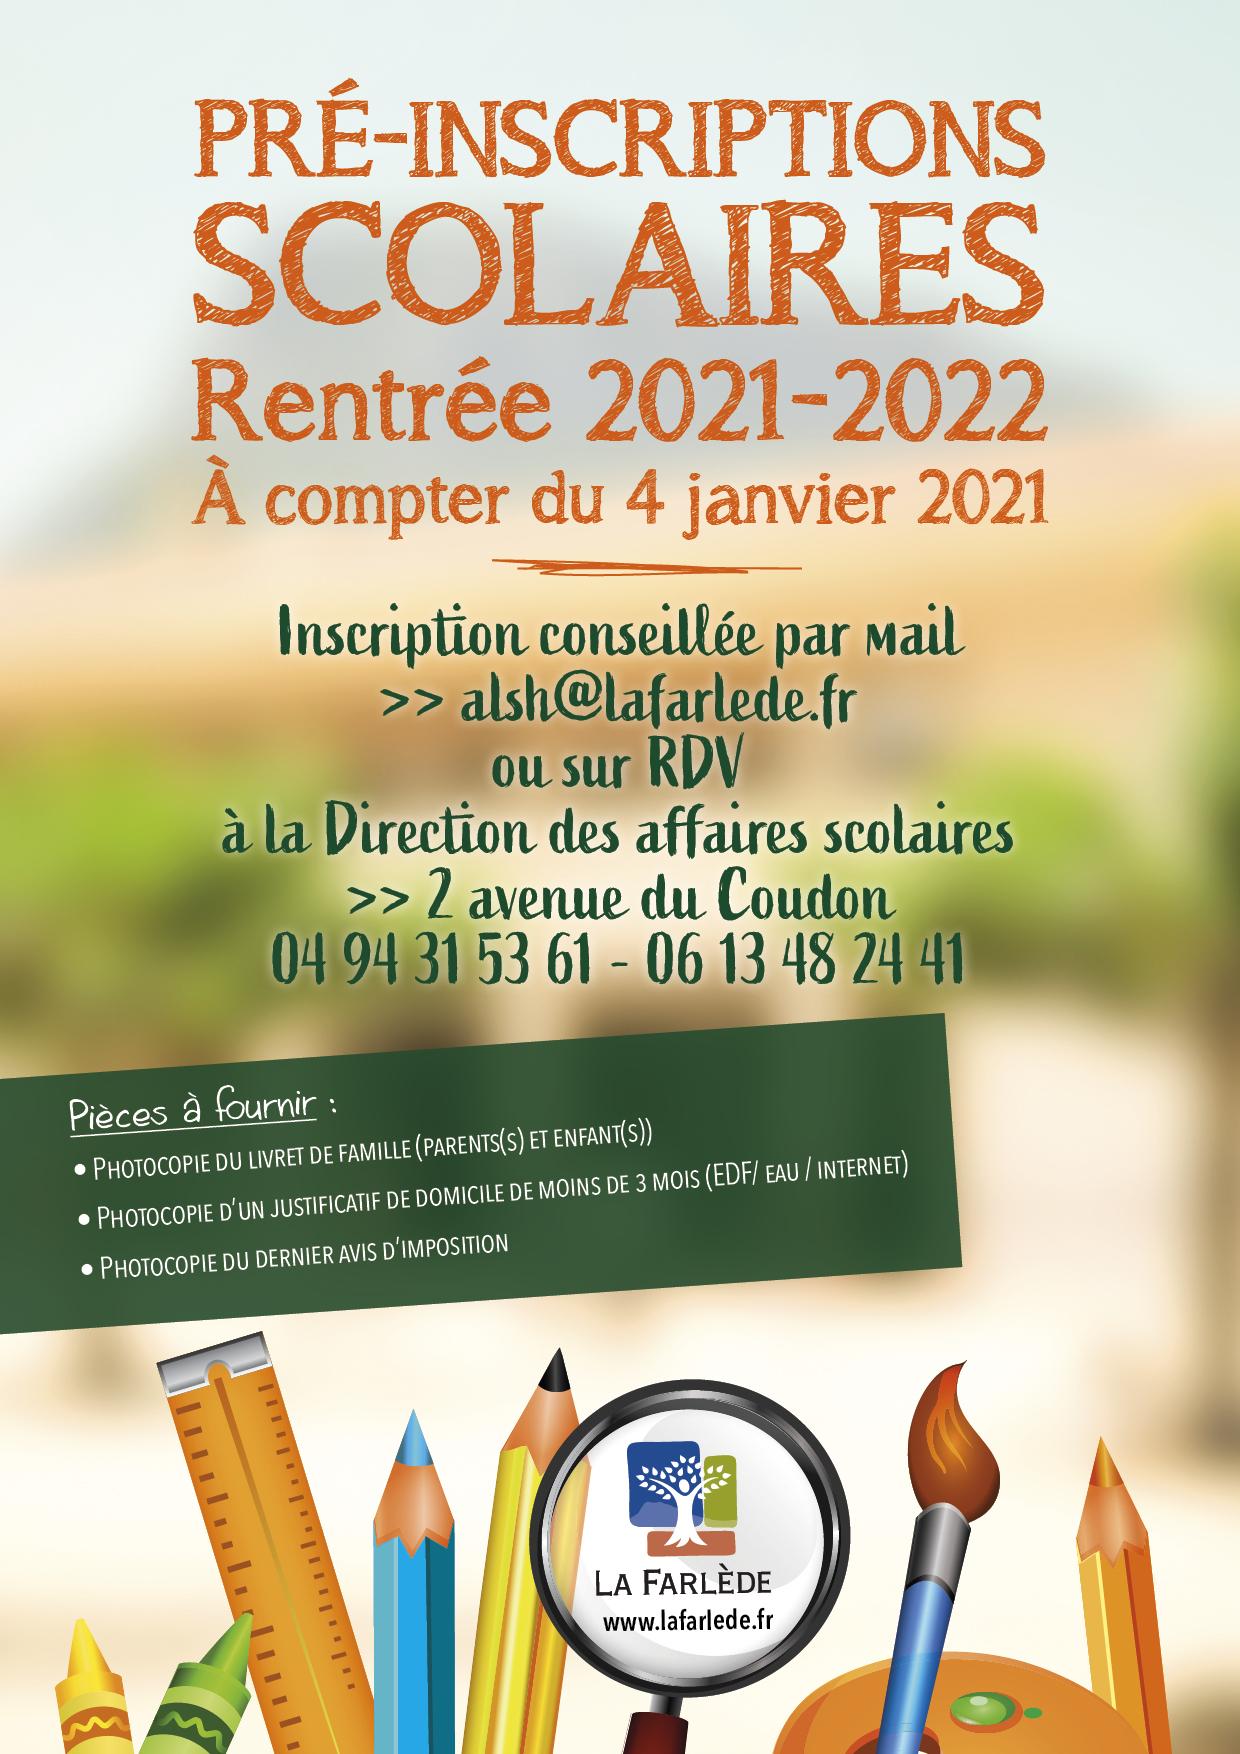 as-a3-inscription-scolaire-2021-2022-web.jpg